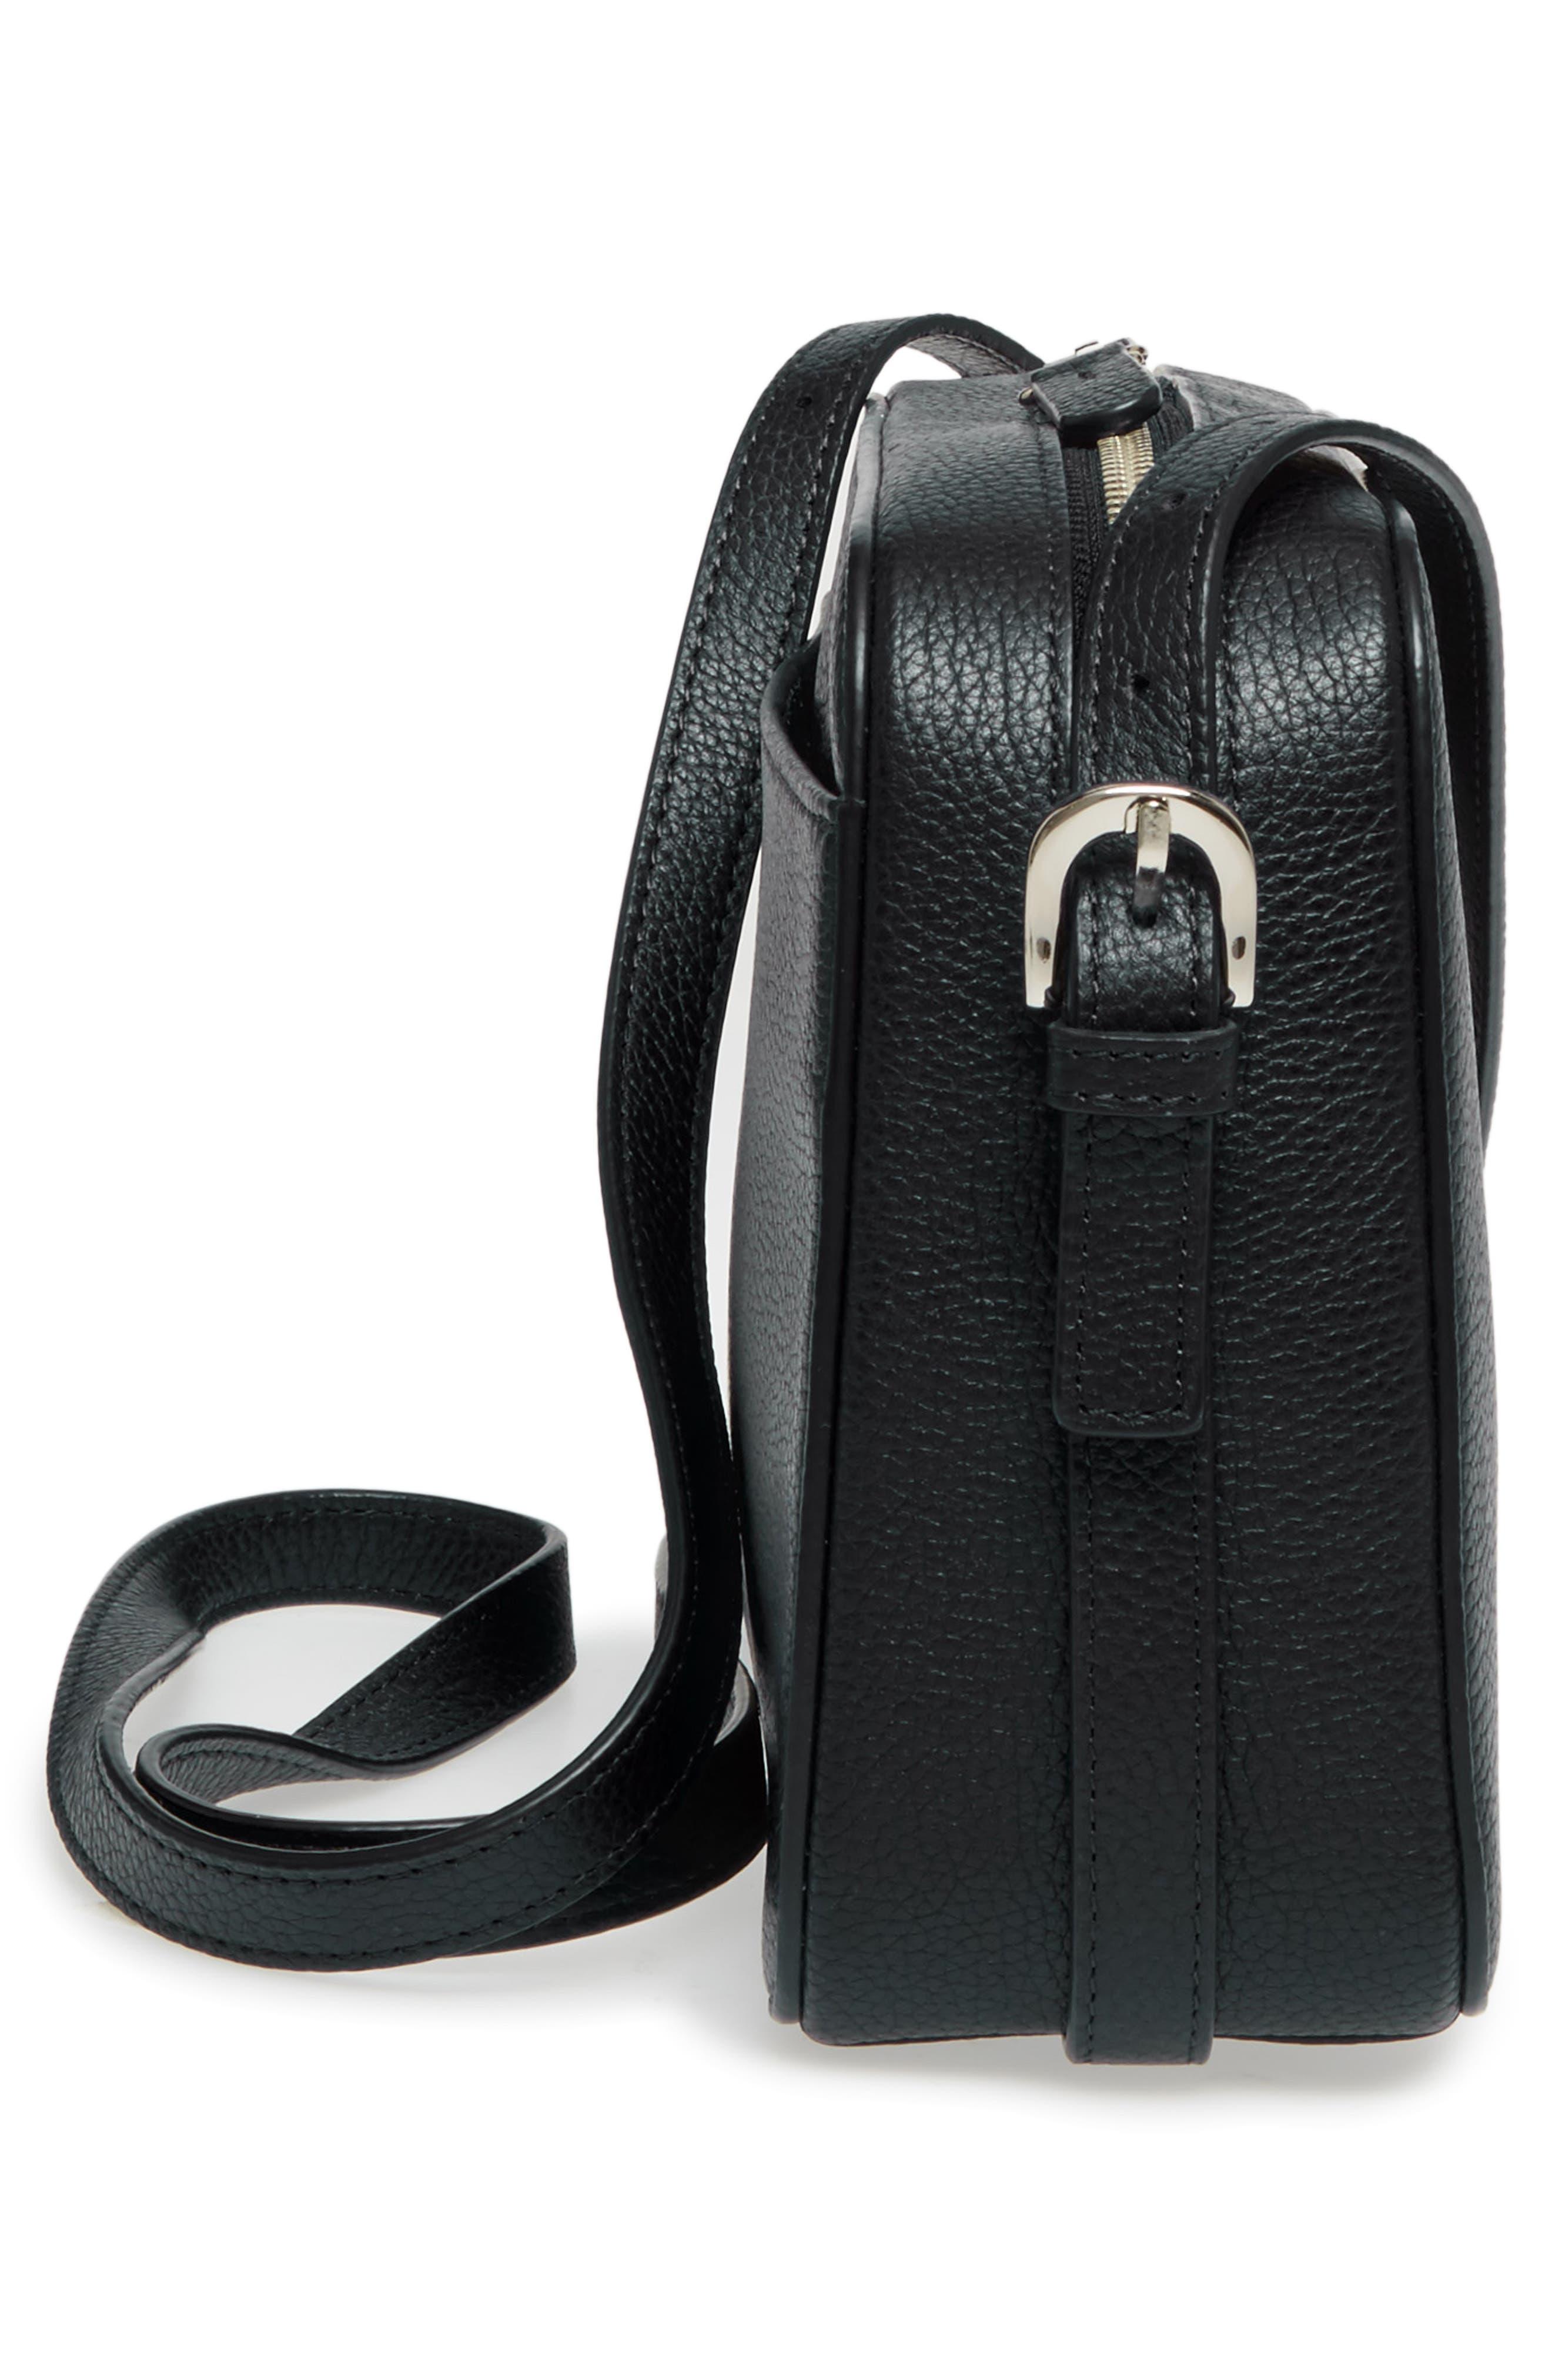 Brayden Leather Crossbody Camera Bag,                             Alternate thumbnail 5, color,                             001